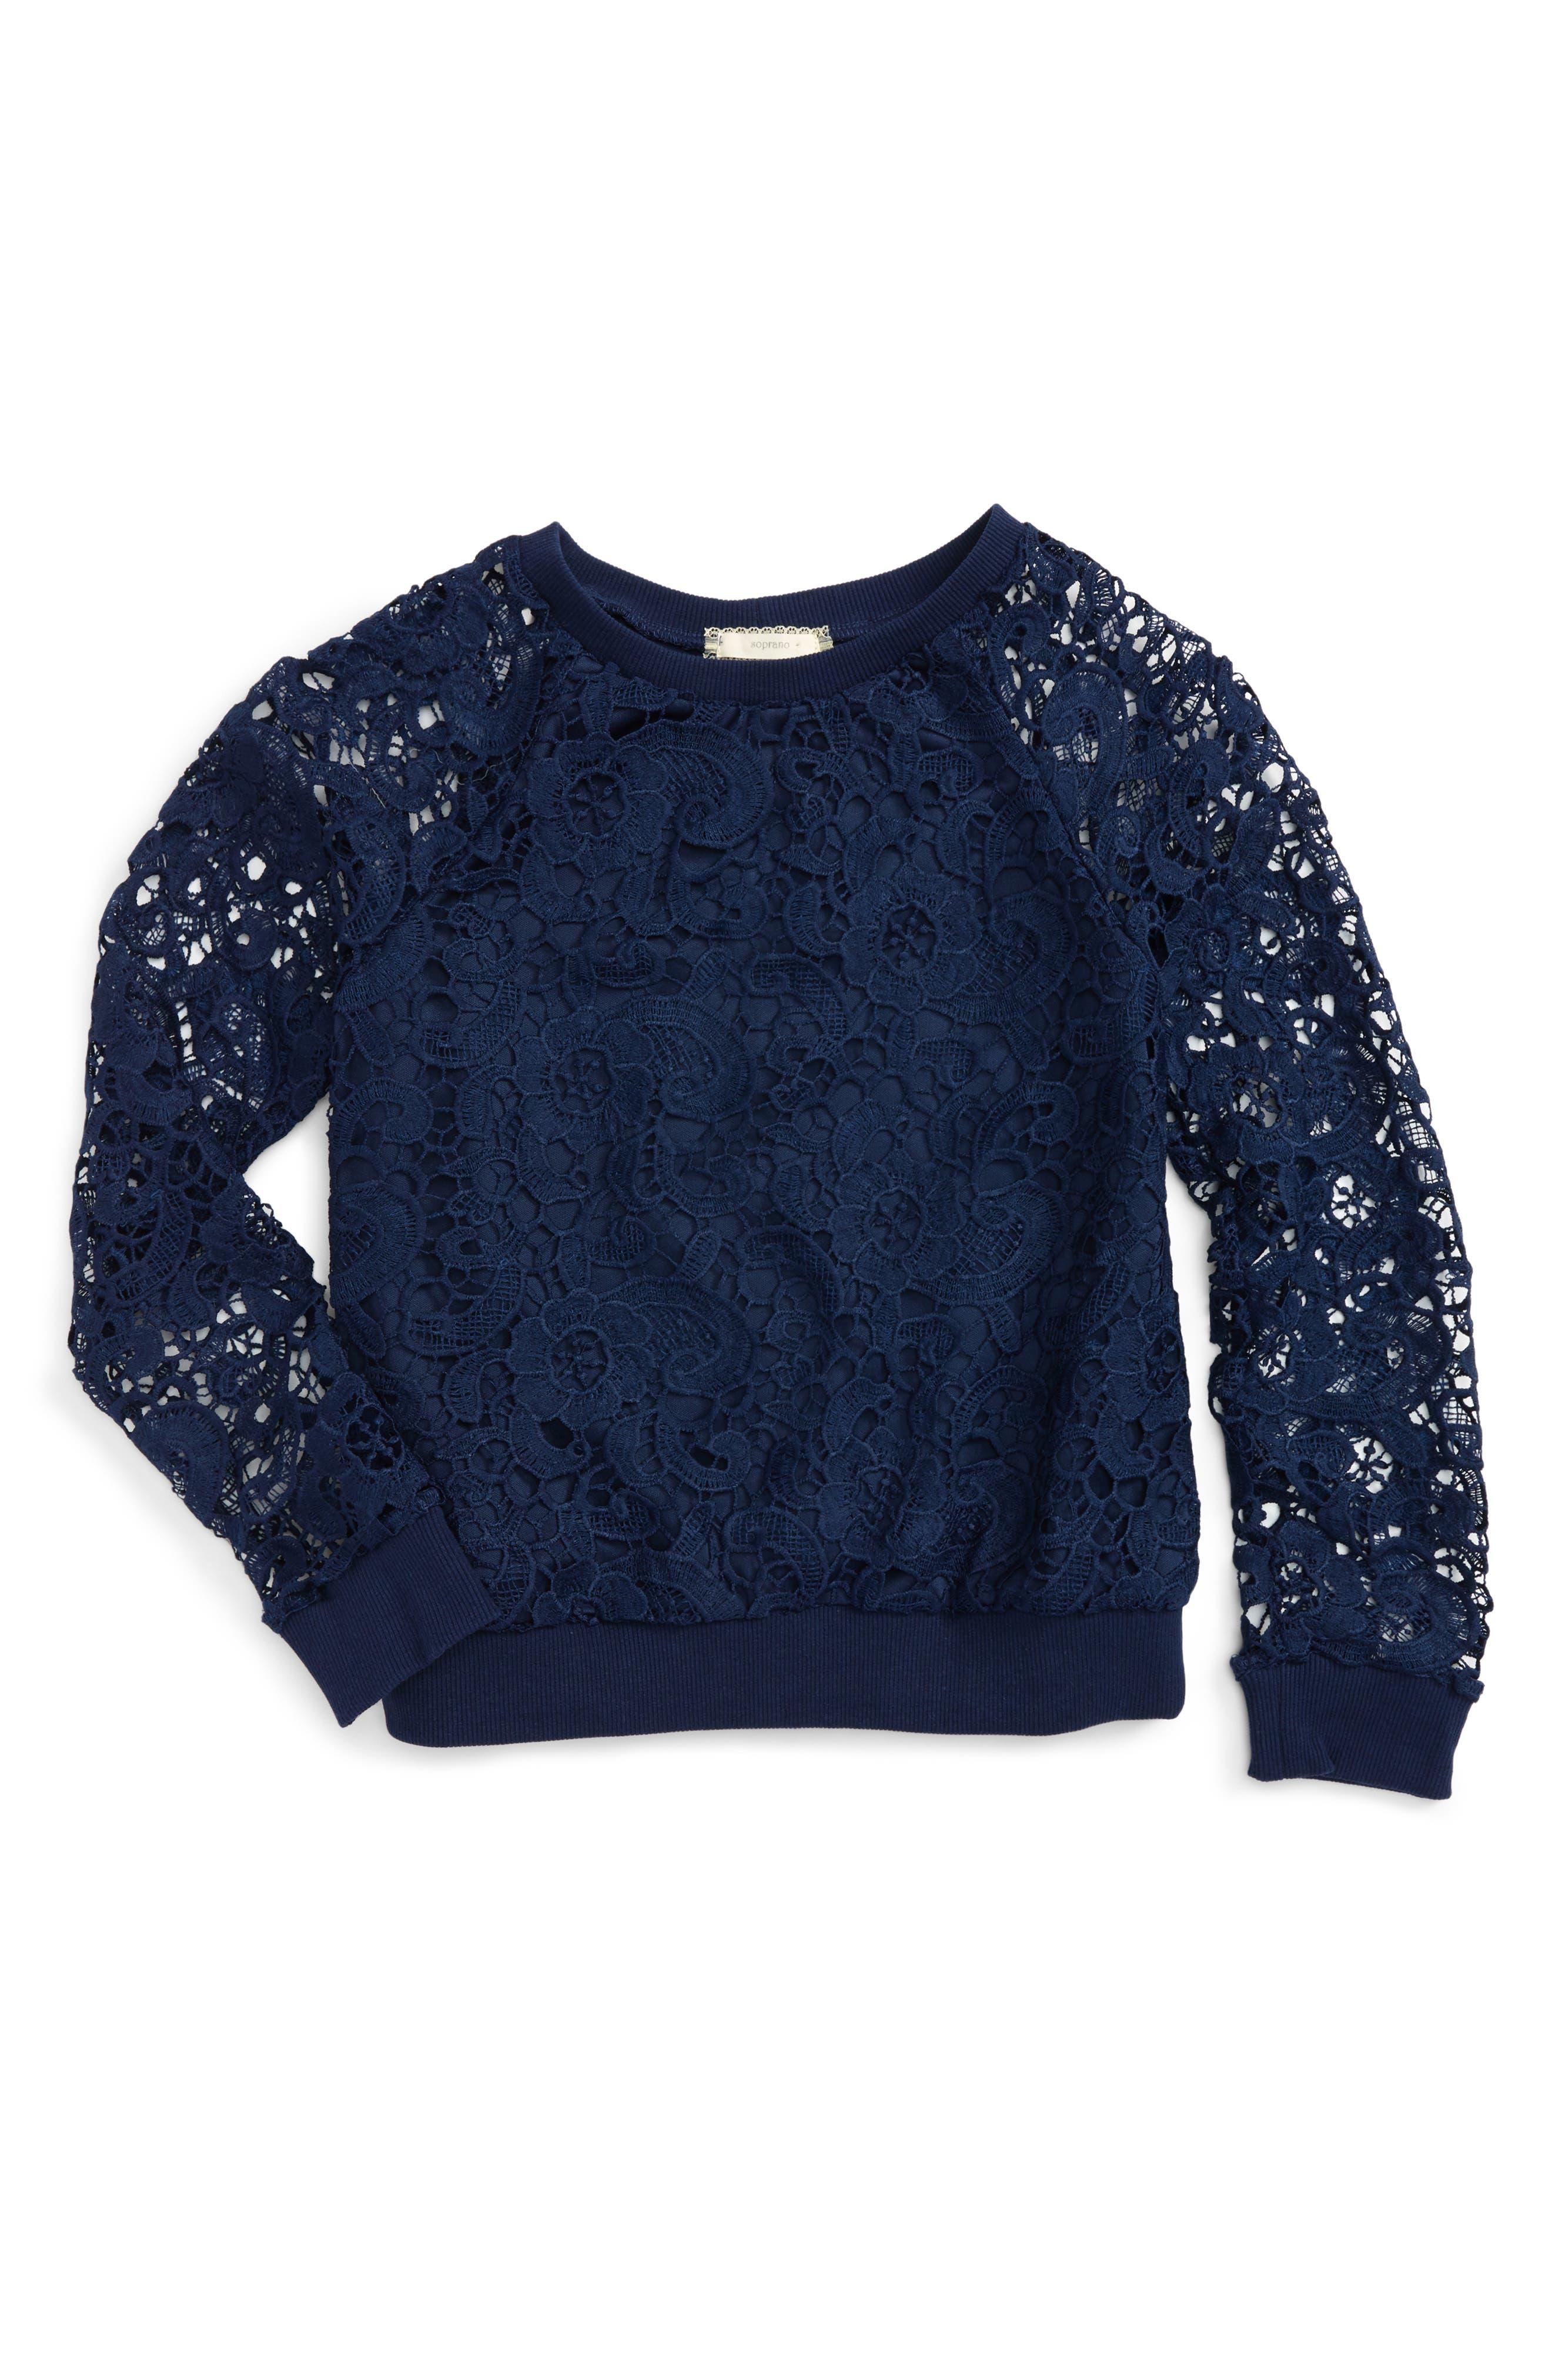 Lace Overlay Sweatshirt,                         Main,                         color, 380 Navy